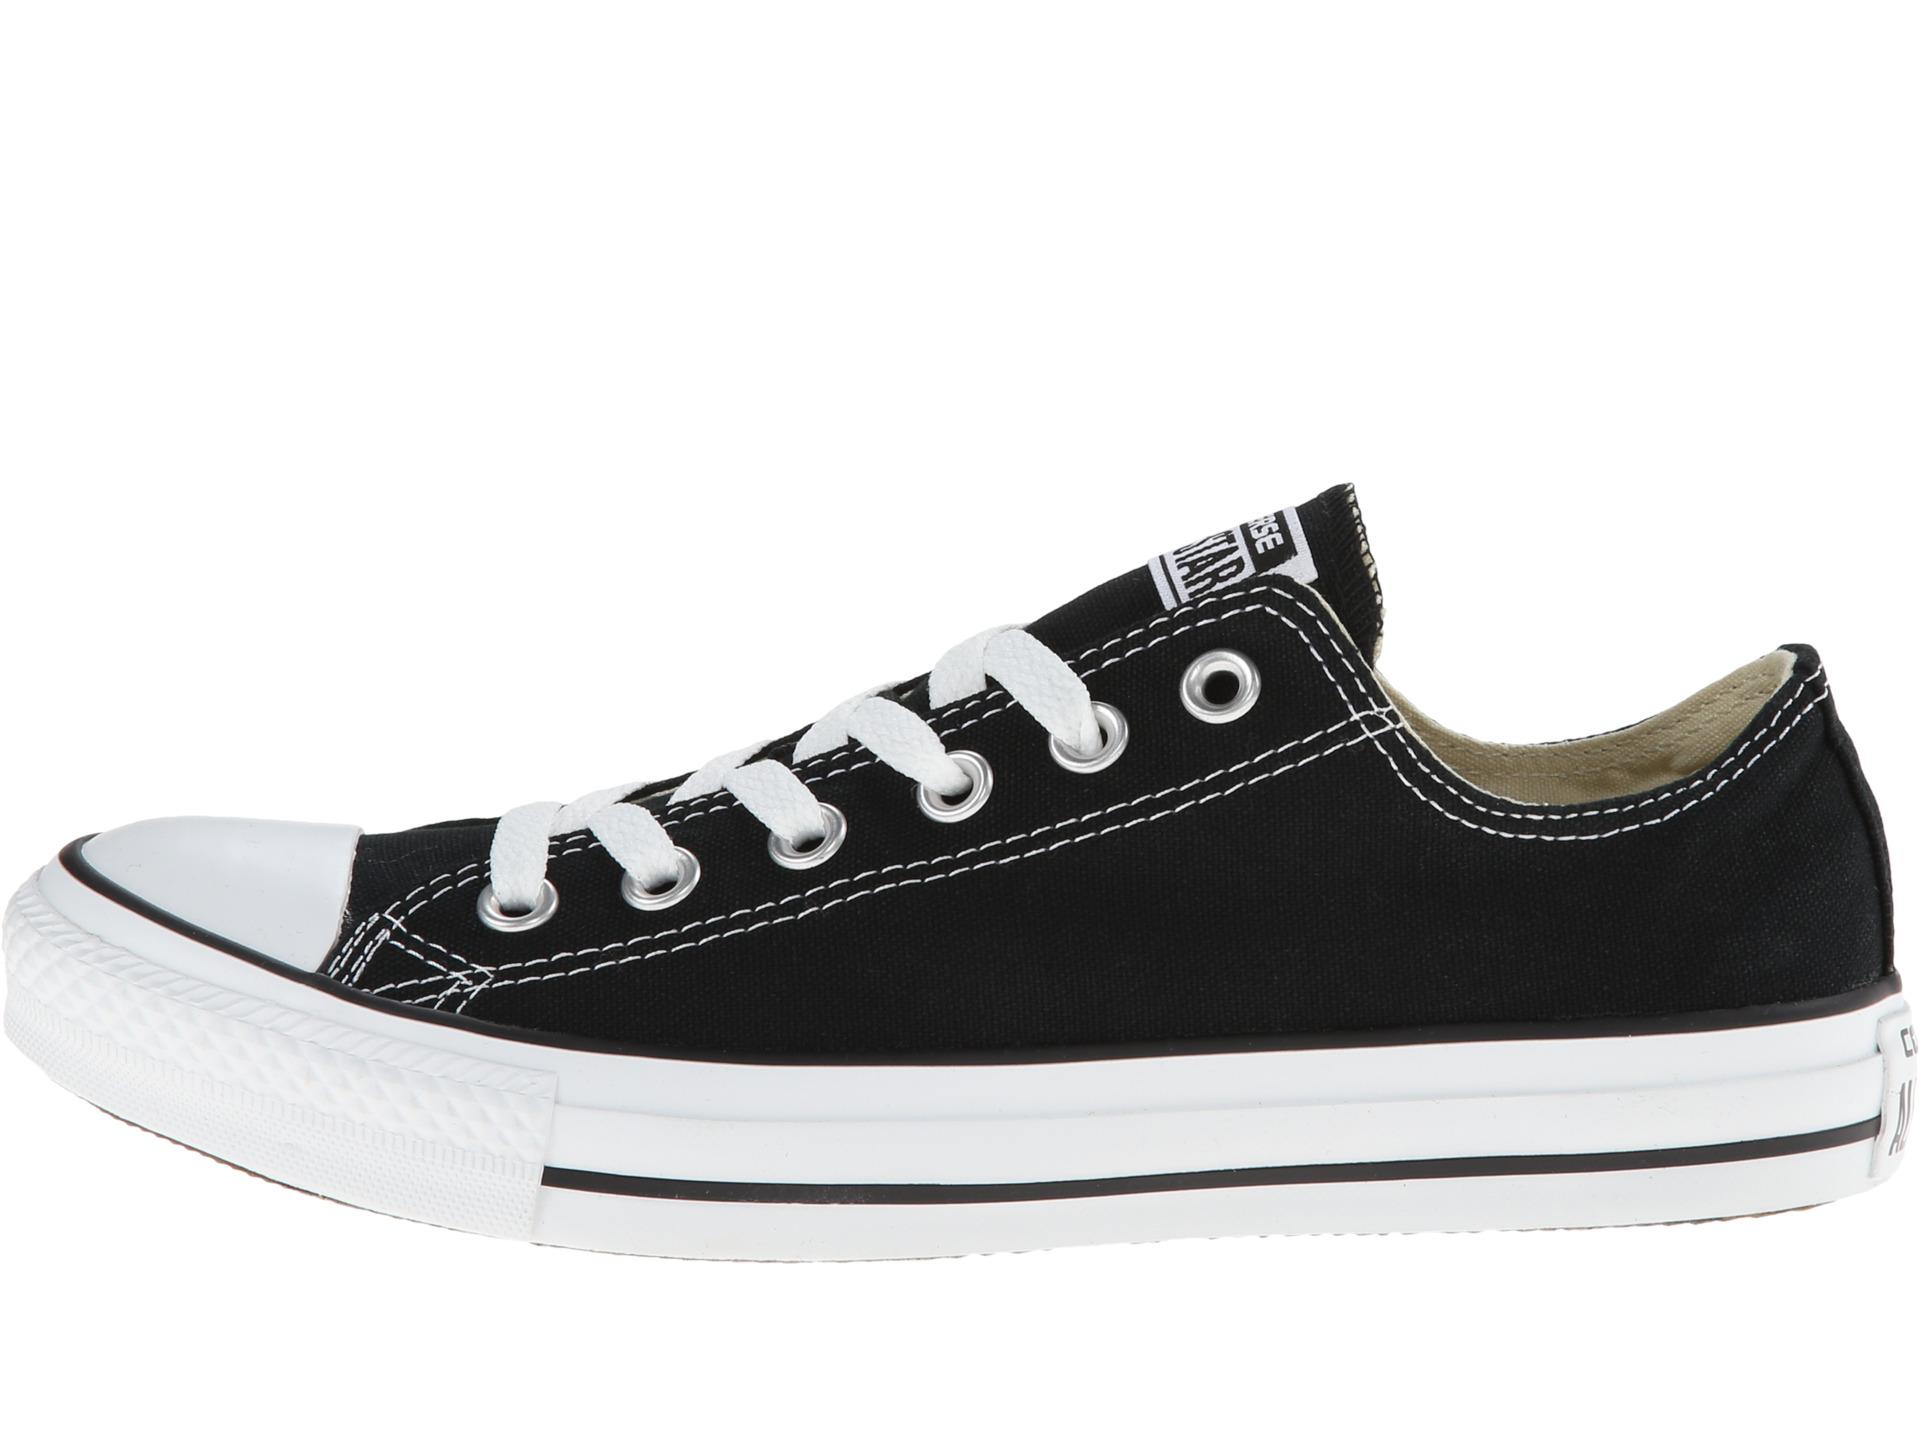 Converse Chuck Taylor Low Top Men S Casual Shoe